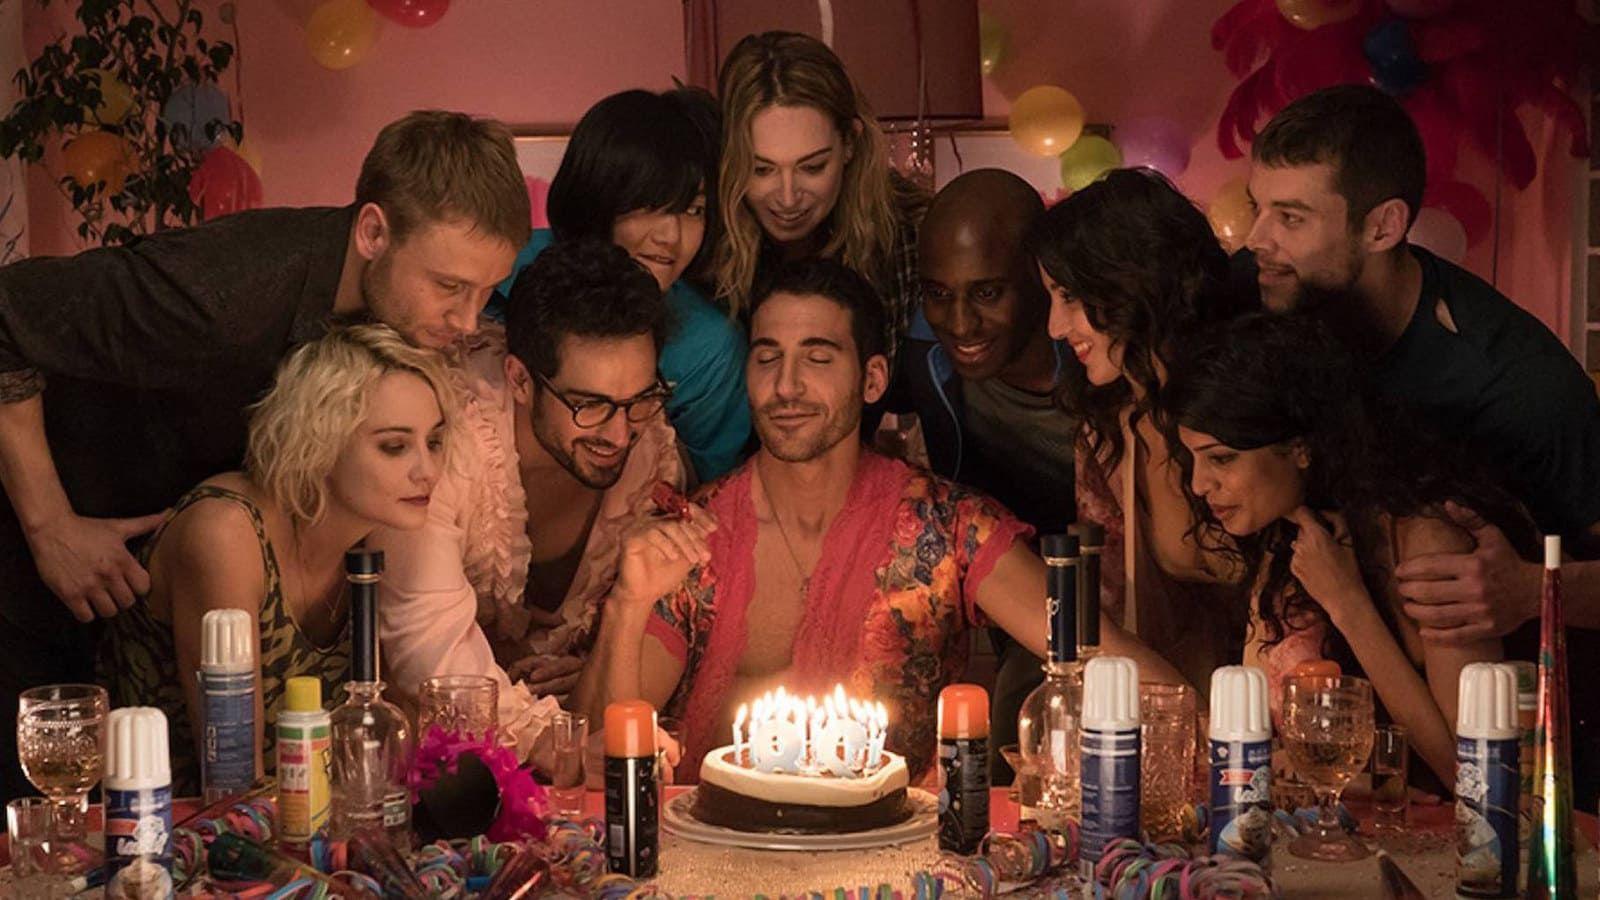 Pin on Netflix shows to binge